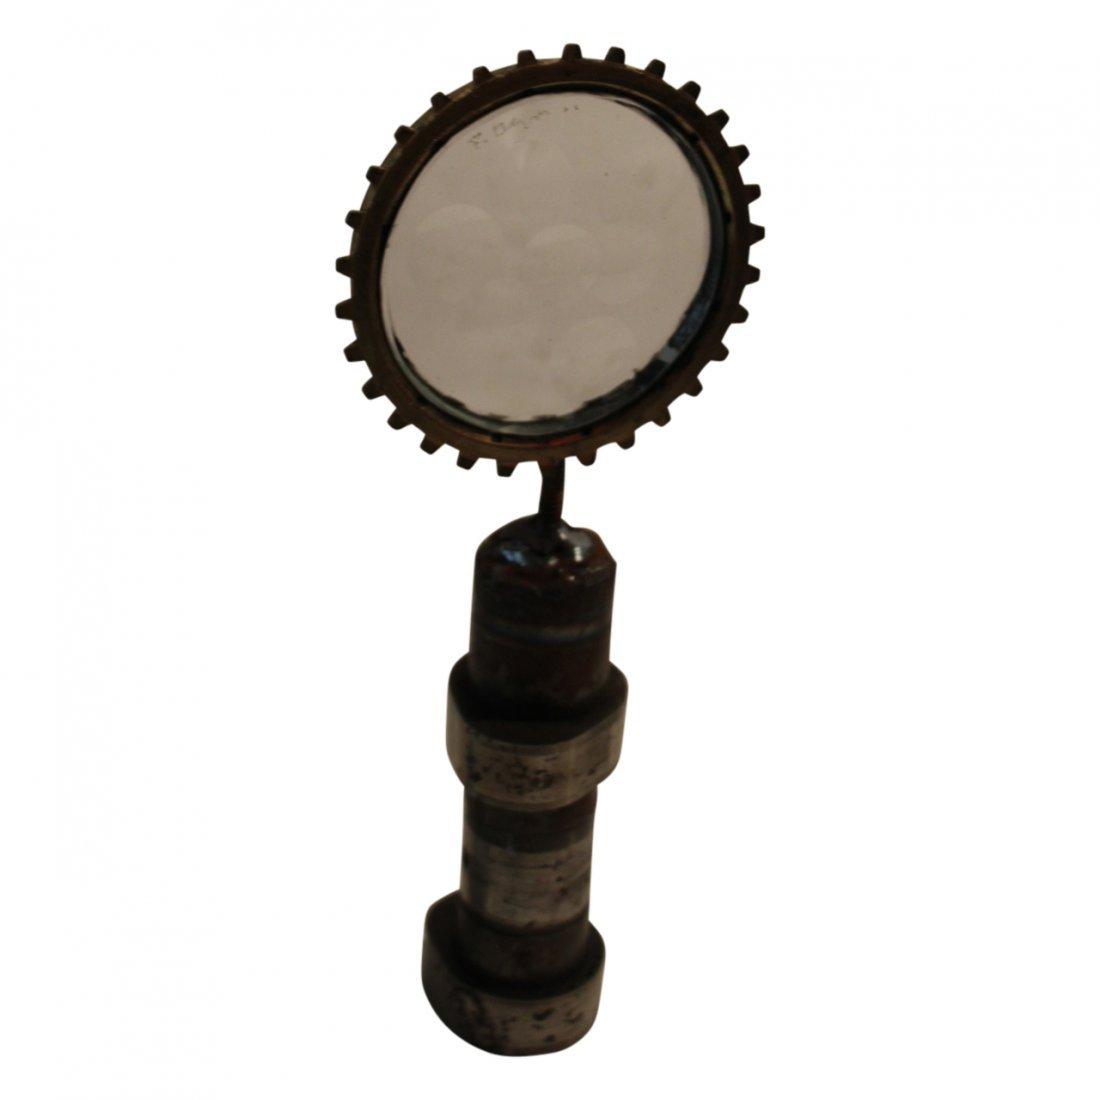 1 Feliciano Bejar Brass and Crystal Miniature Magiscope